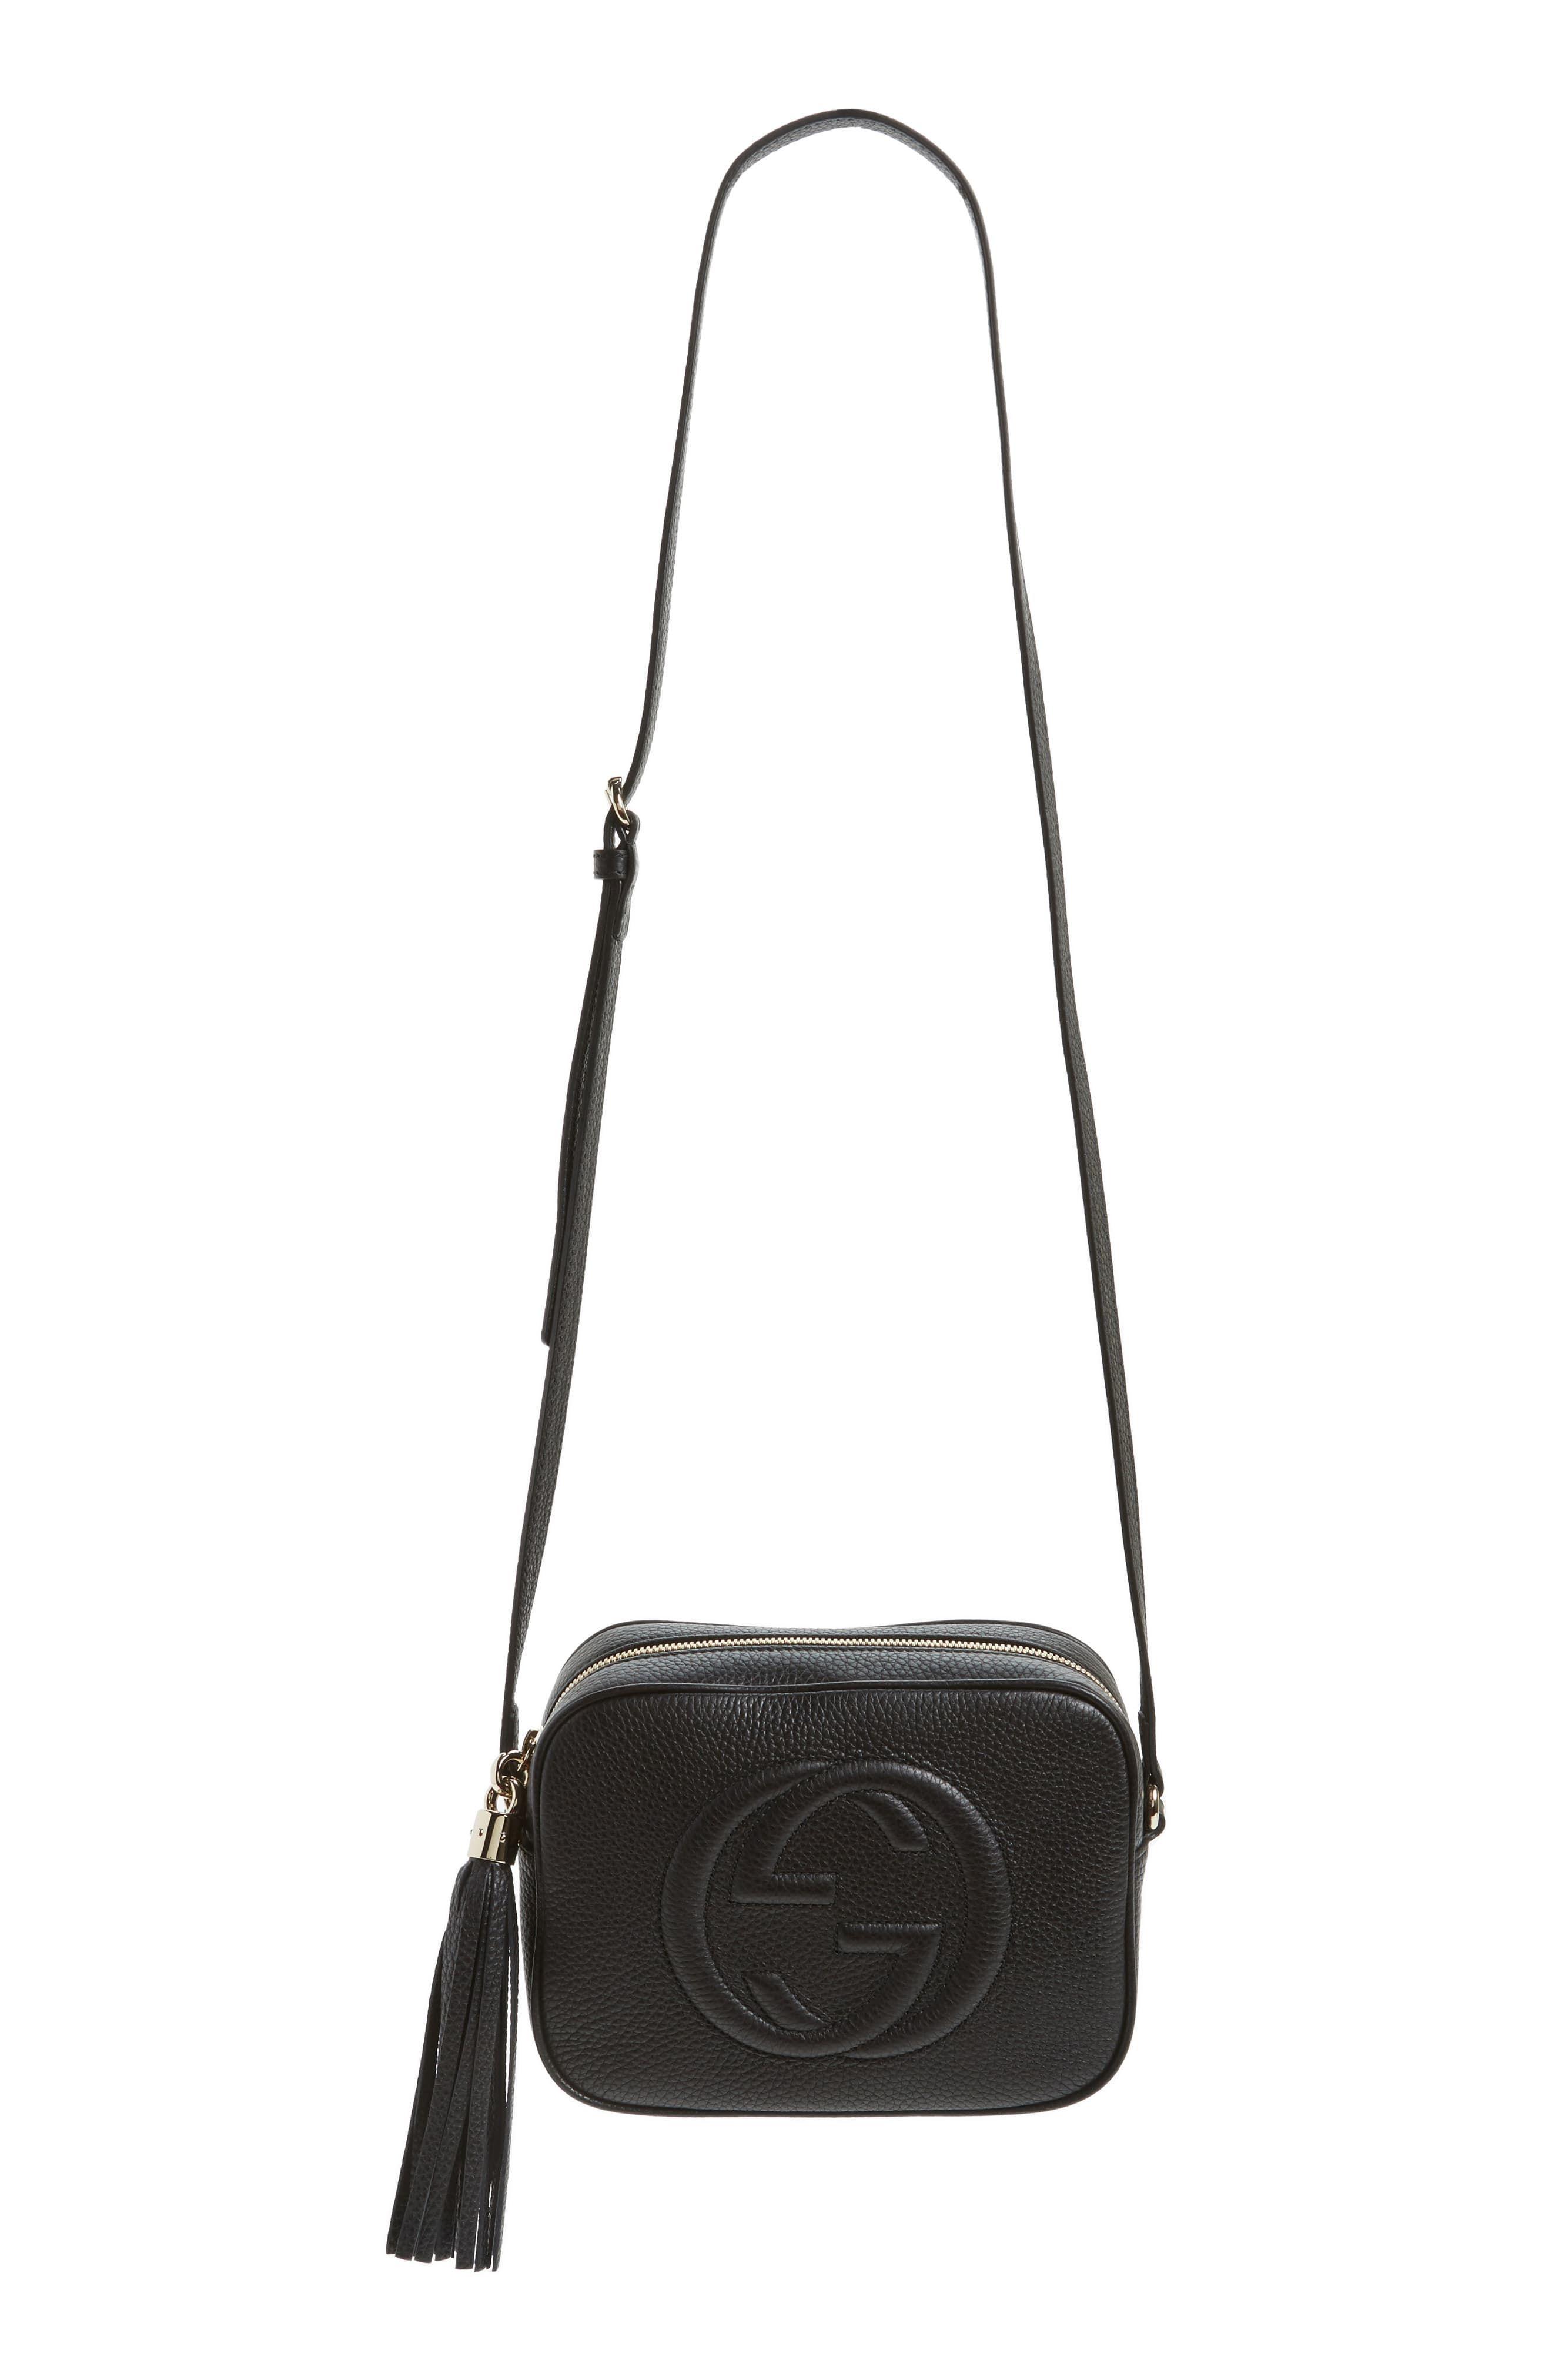 f179bf5e9 Gucci Soho Disco Leather Bag - Black in 2019   Products   Gucci soho ...